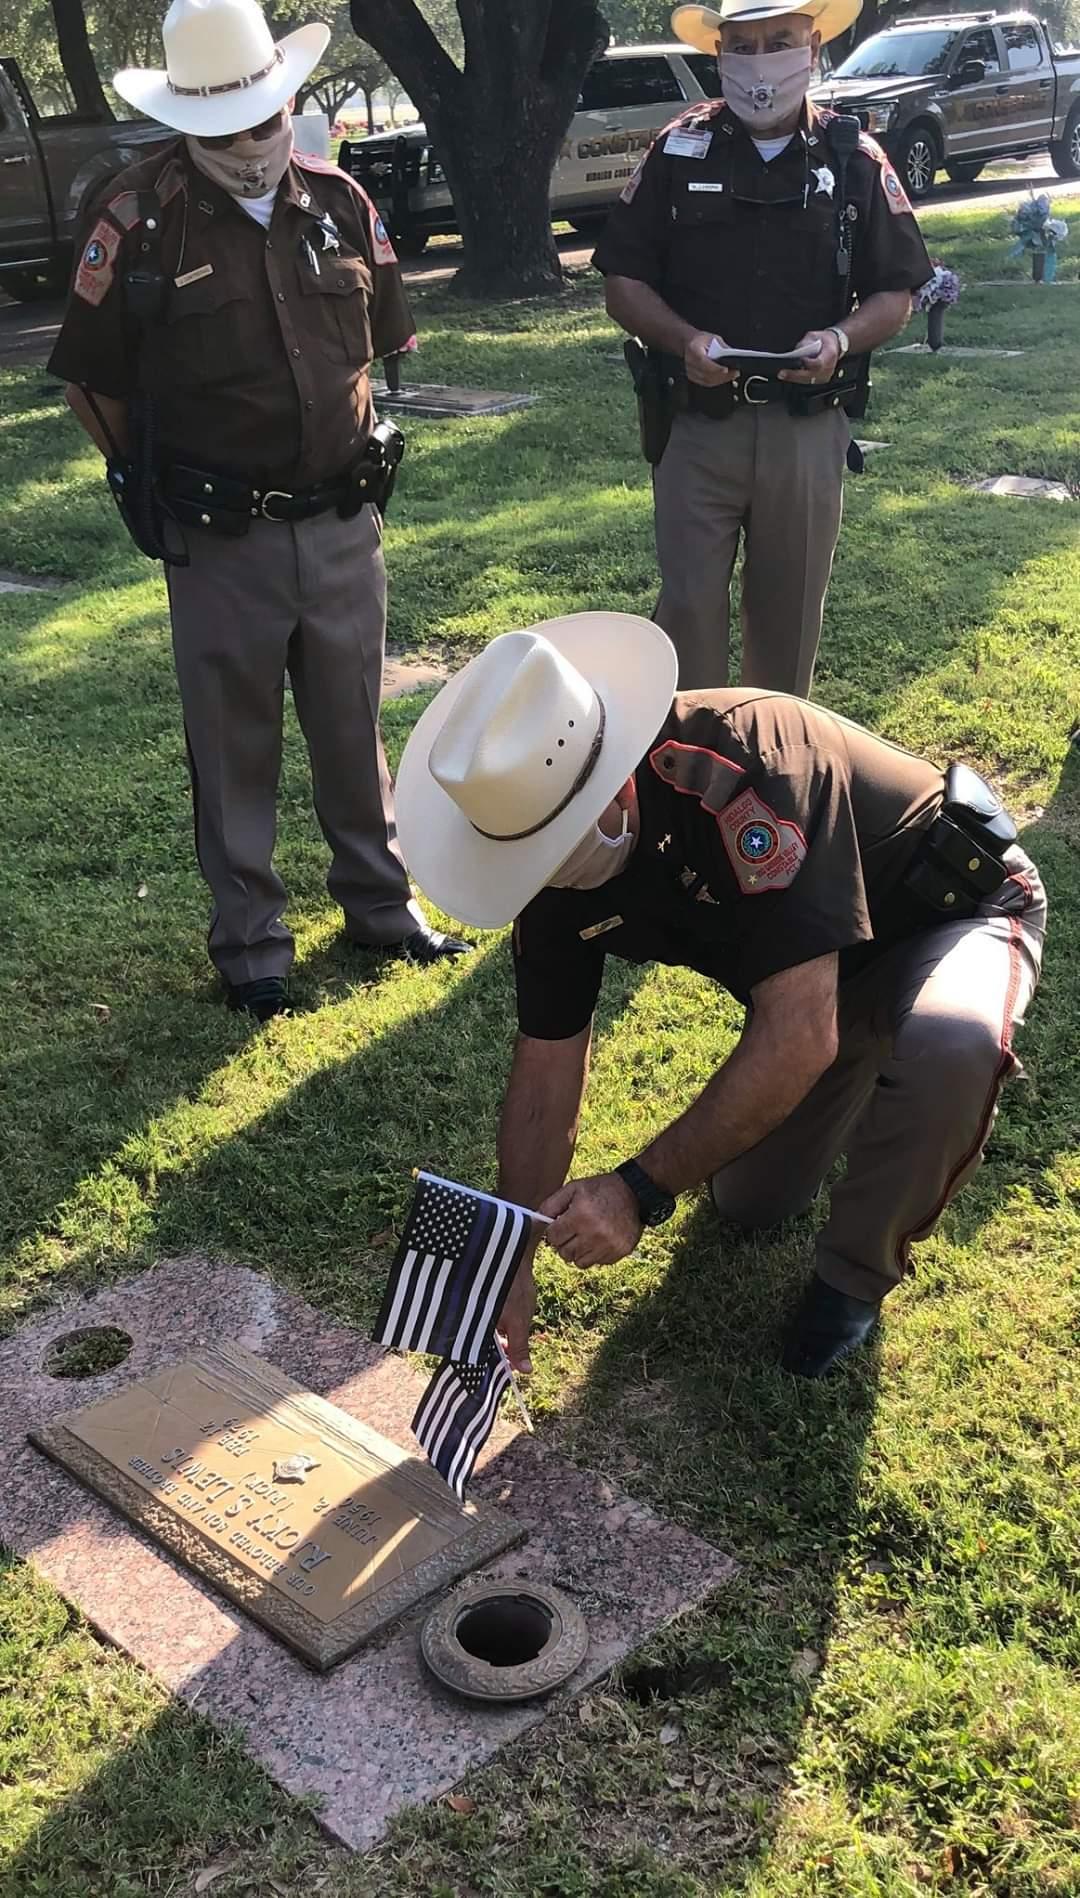 Deputy Constable Ricky Steven Lewis | Hidalgo County Constable's Office - Precinct 3, Texas